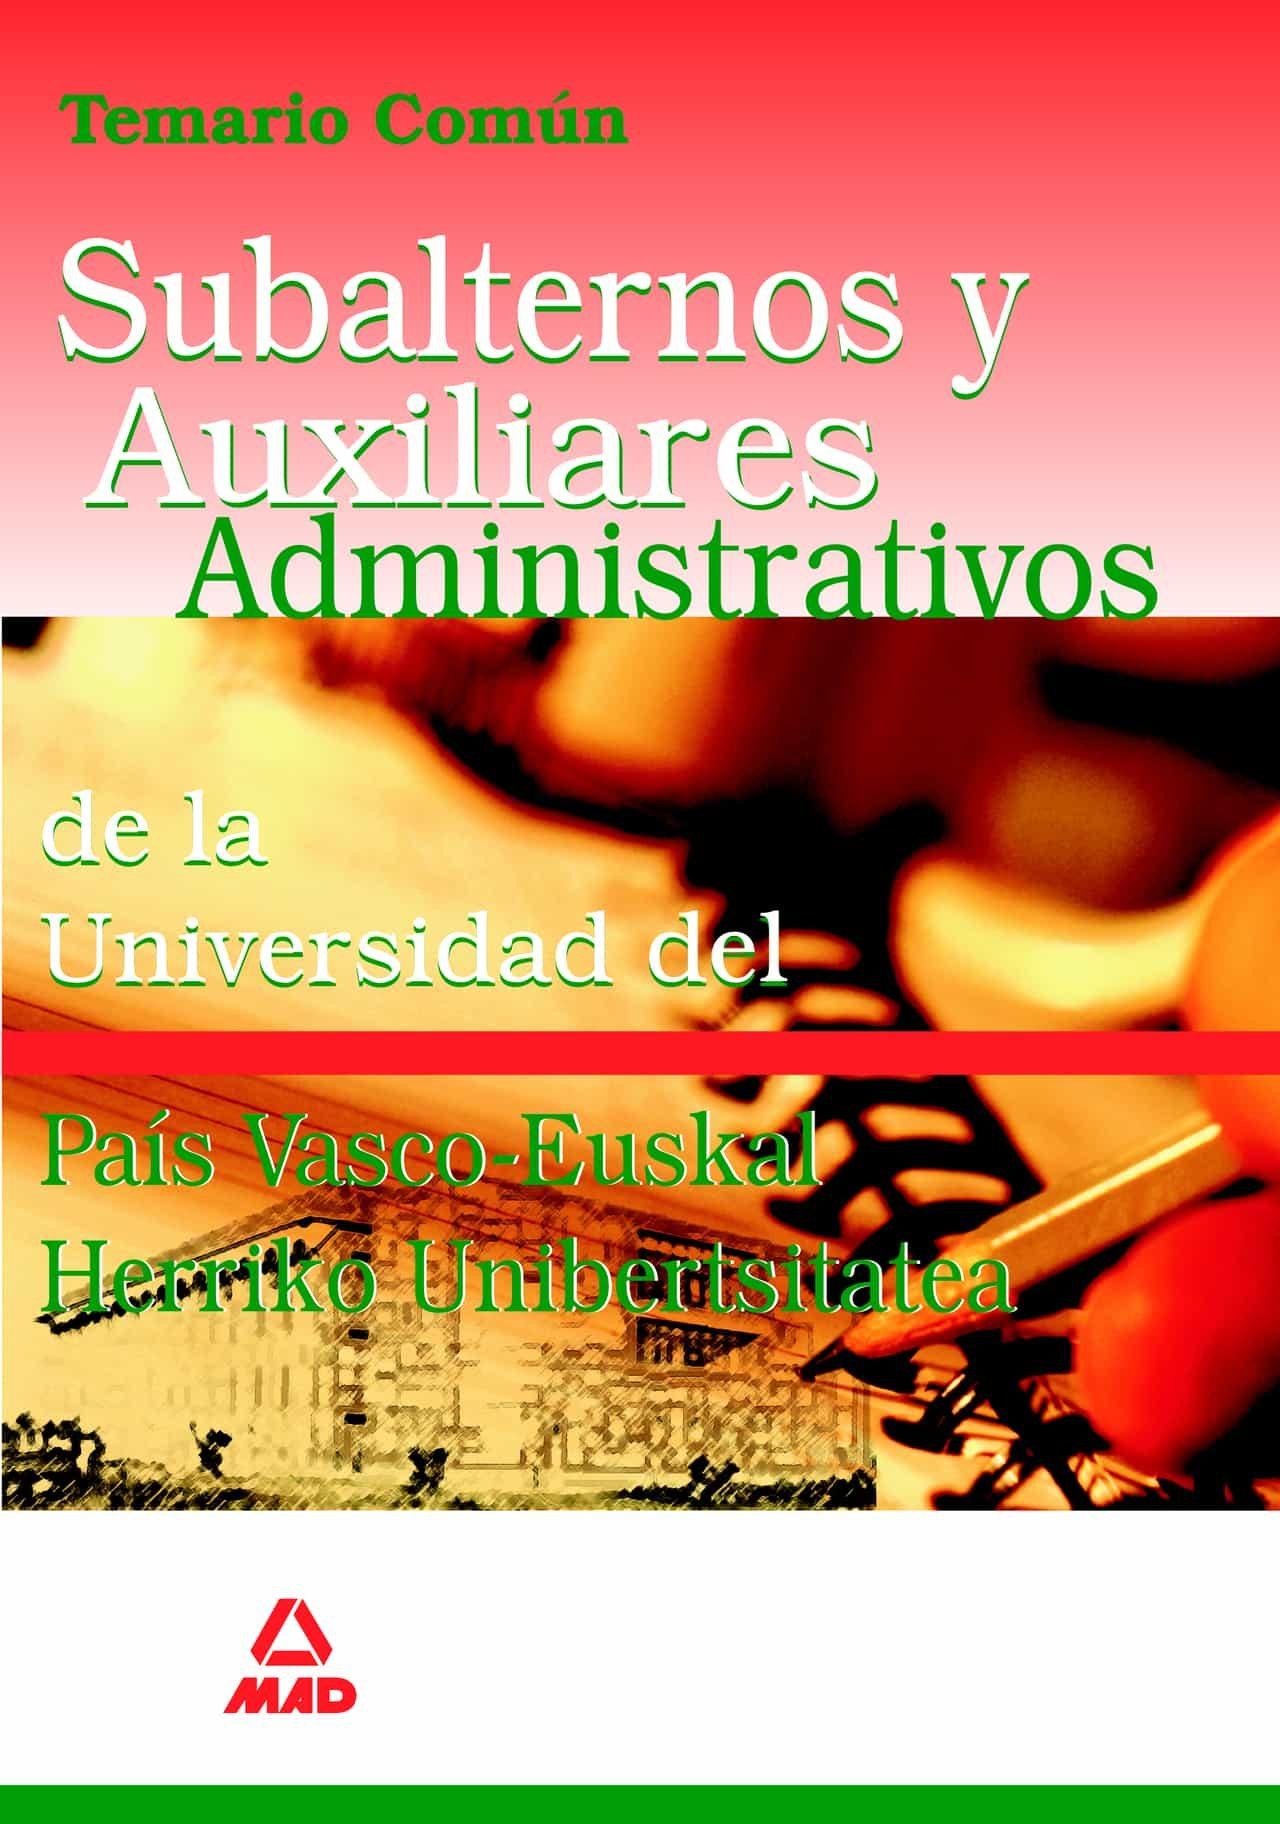 Subalternos Y Auxiliares Administrativos De La Universidad Del Pa Is Vasco-euskal Herriko Unibertsitatea Temario Comun por Vv.aa. Gratis